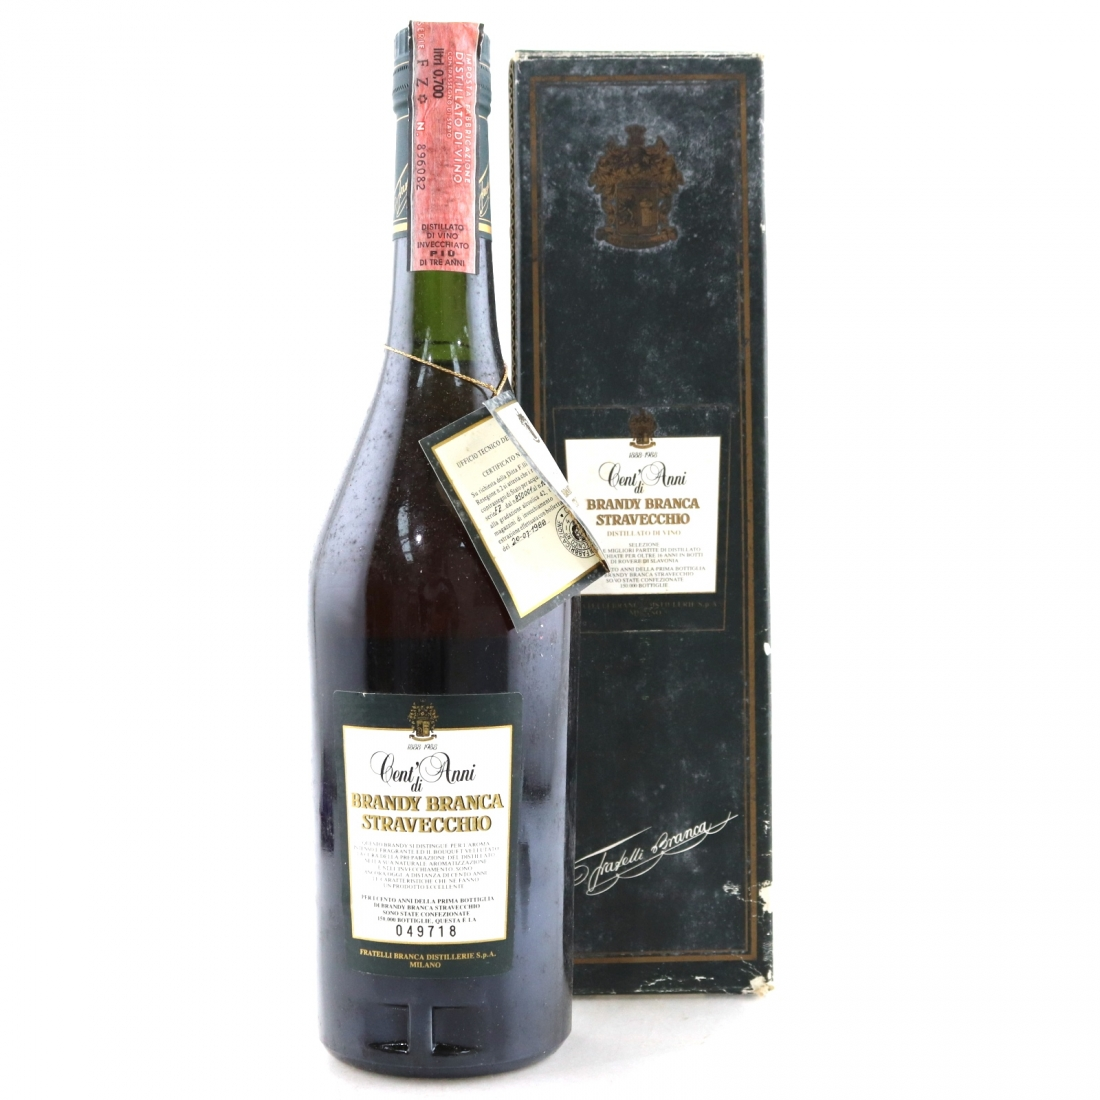 Stravecchio Branca Brandy 1988 / Centenary Release